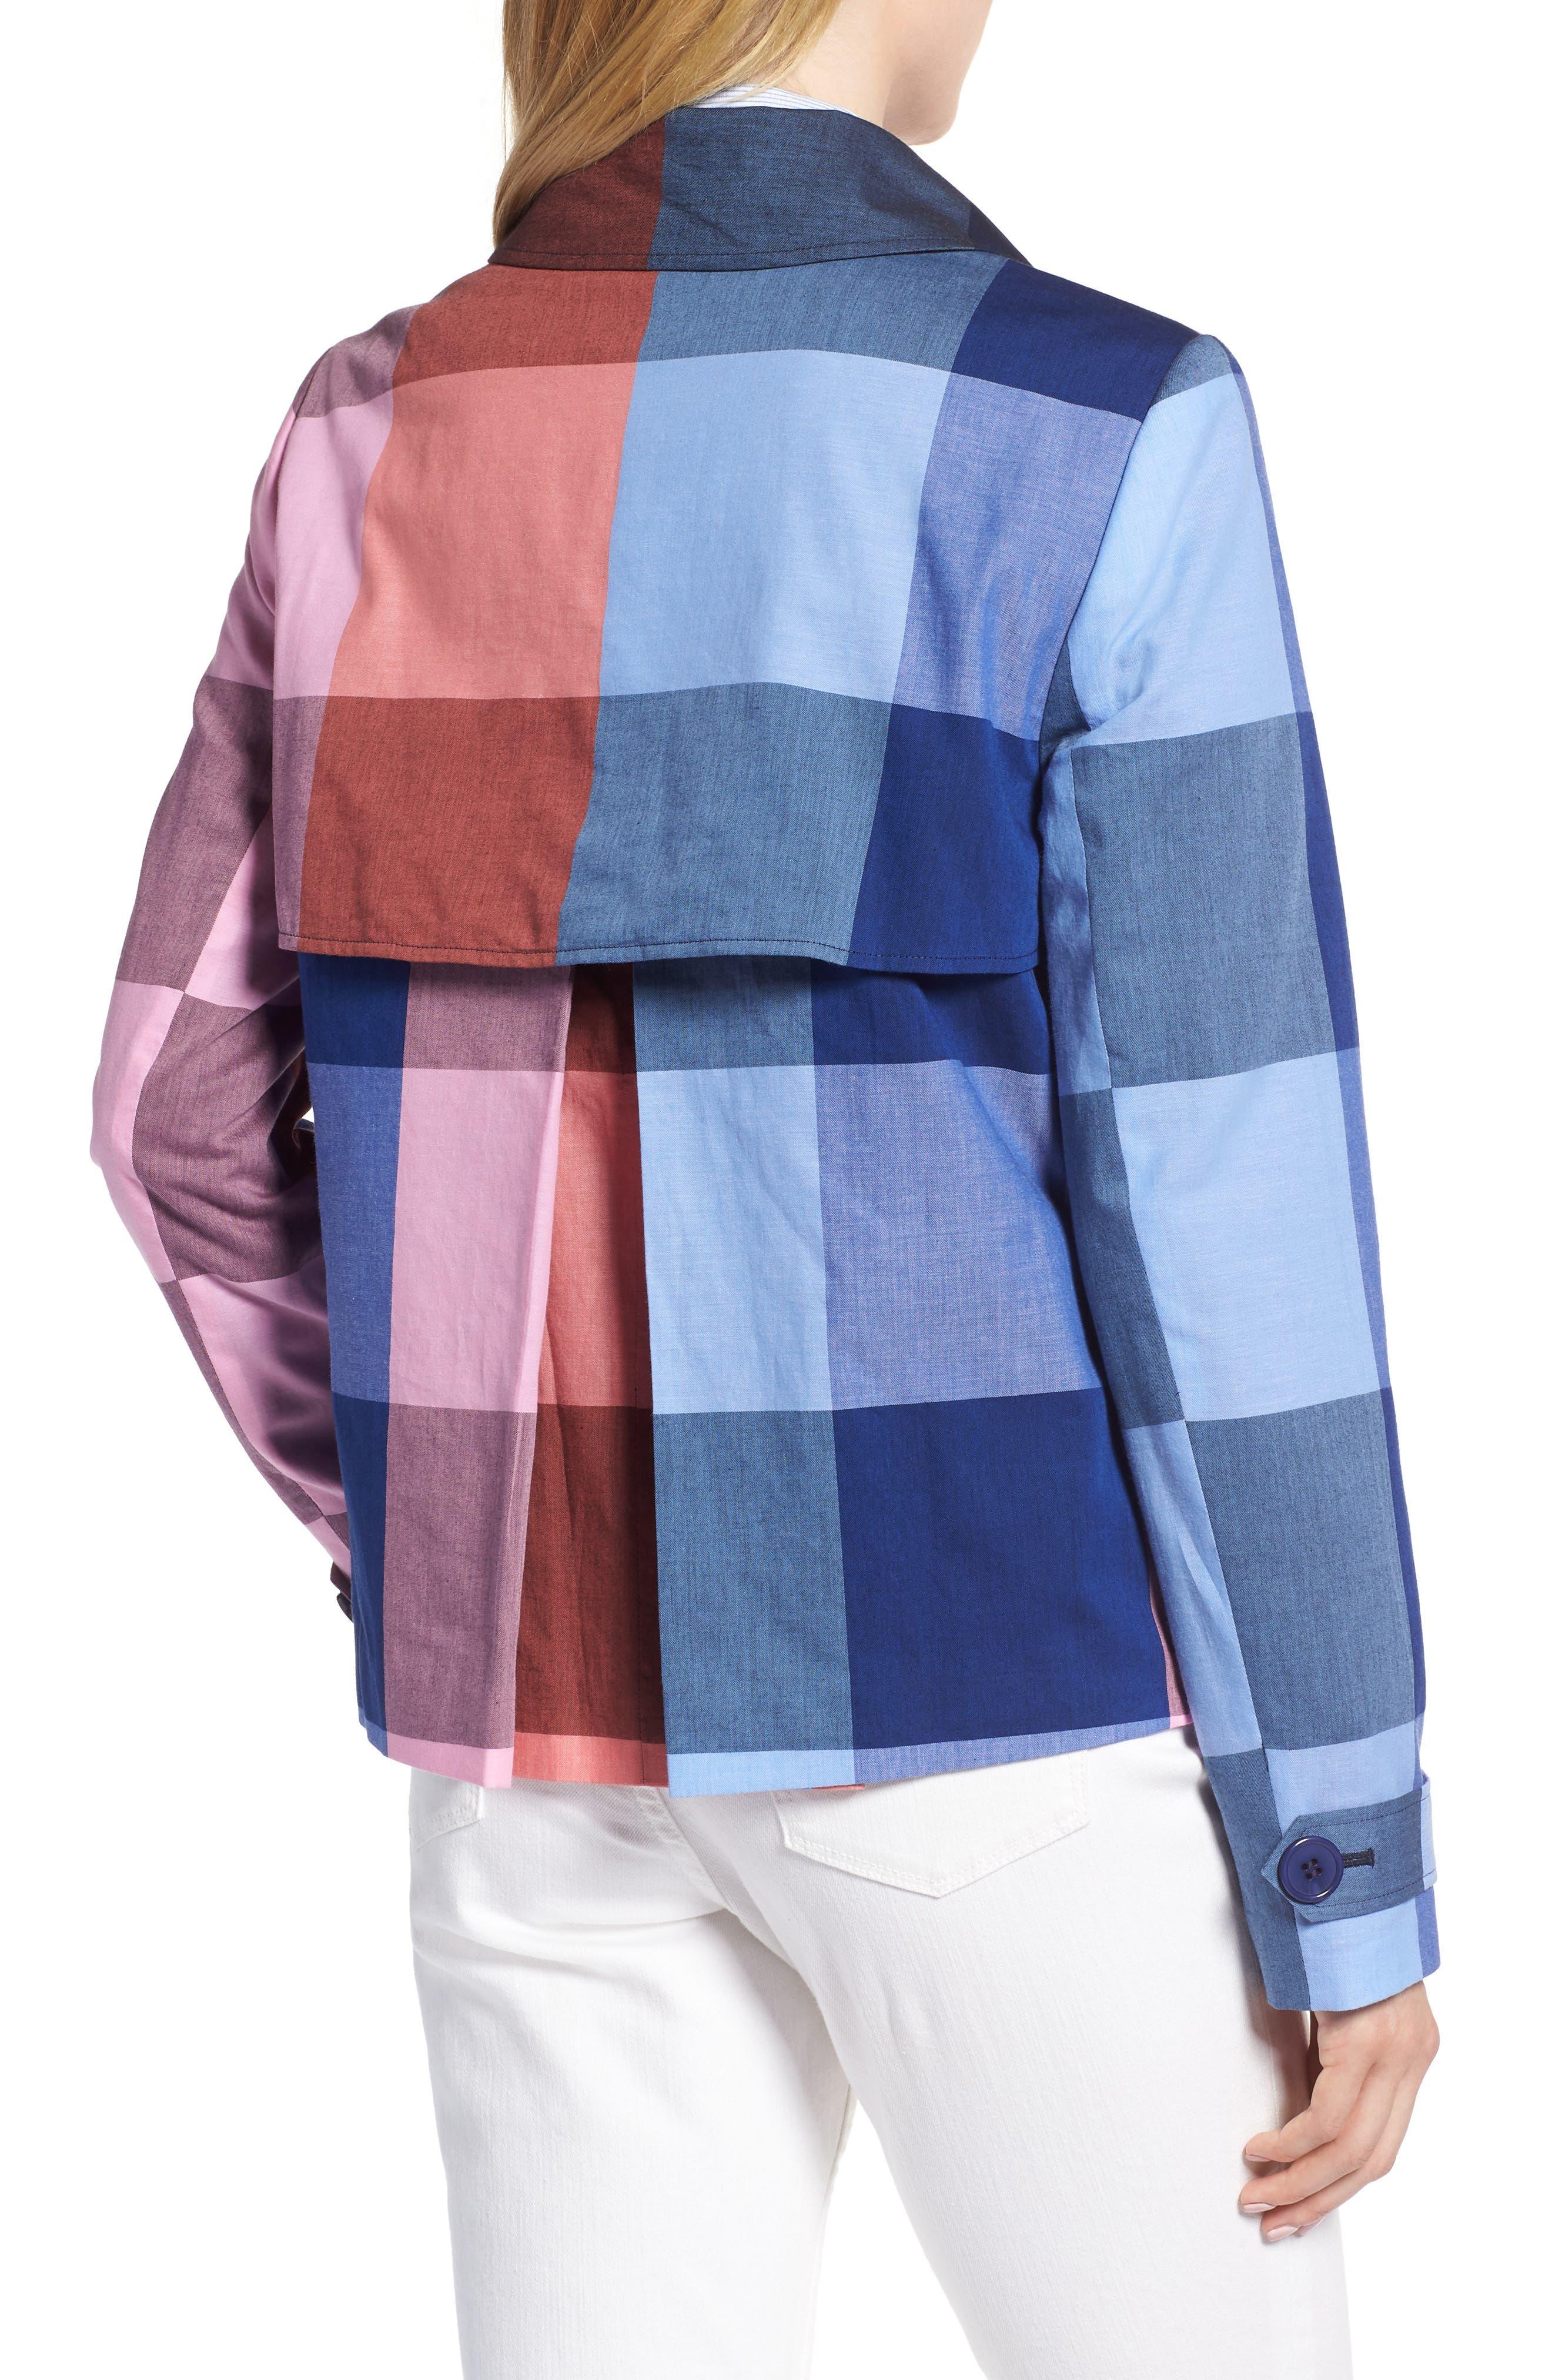 Double Breasted Plaid Cotton Blazer,                             Alternate thumbnail 2, color,                             Pink- Blue Plaid